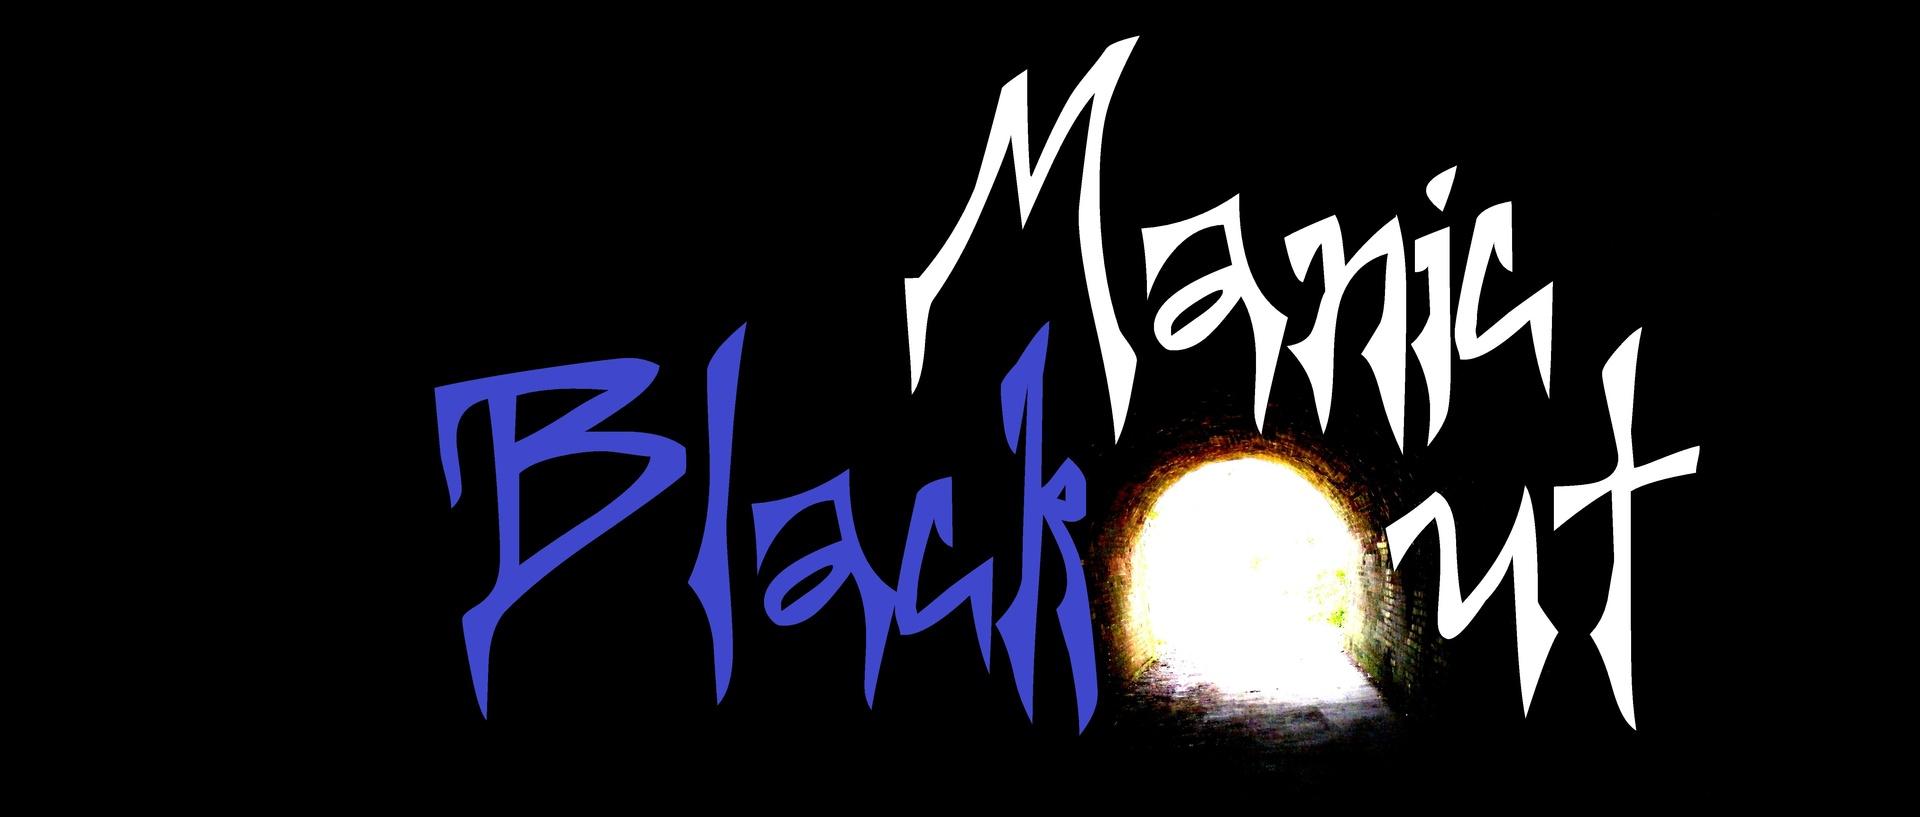 manic blackout